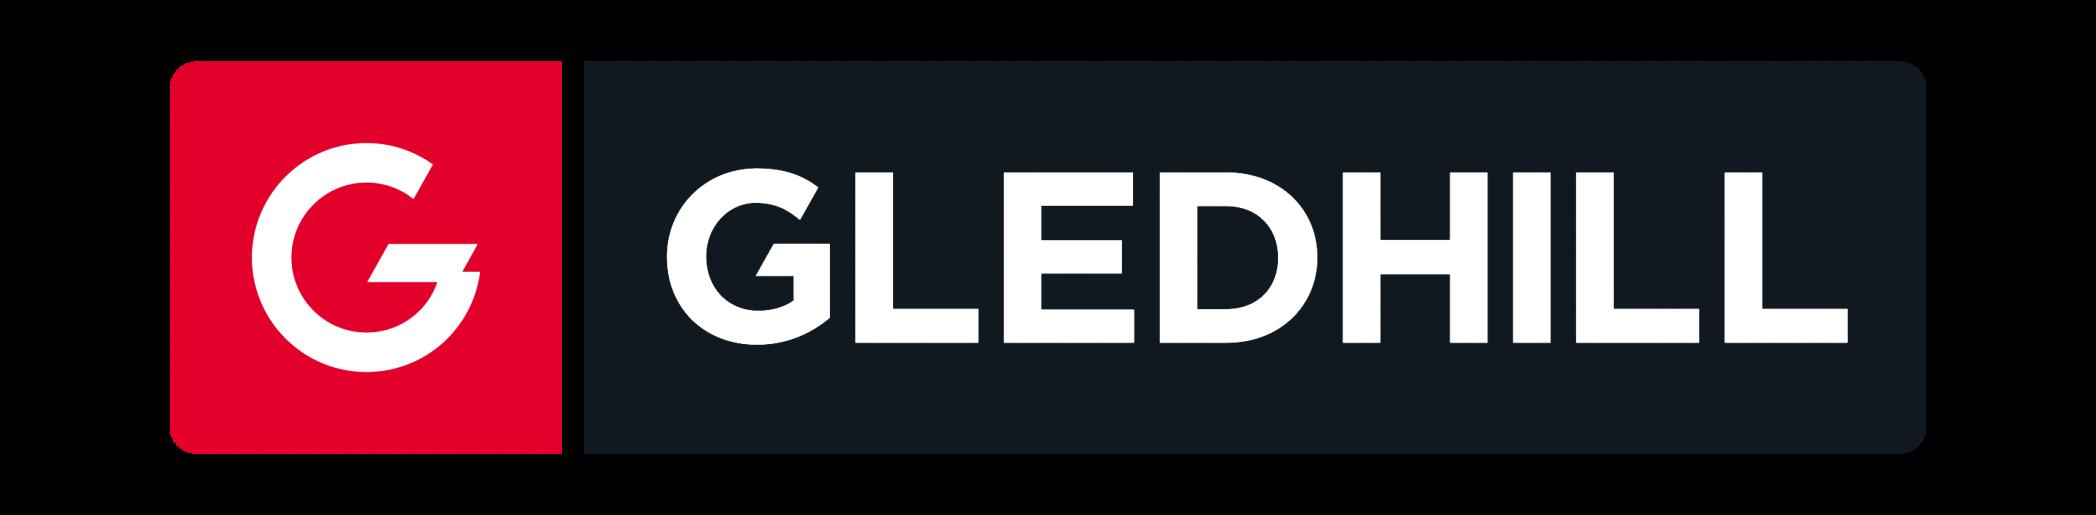 The Gledhill Logo_red&black_RGB